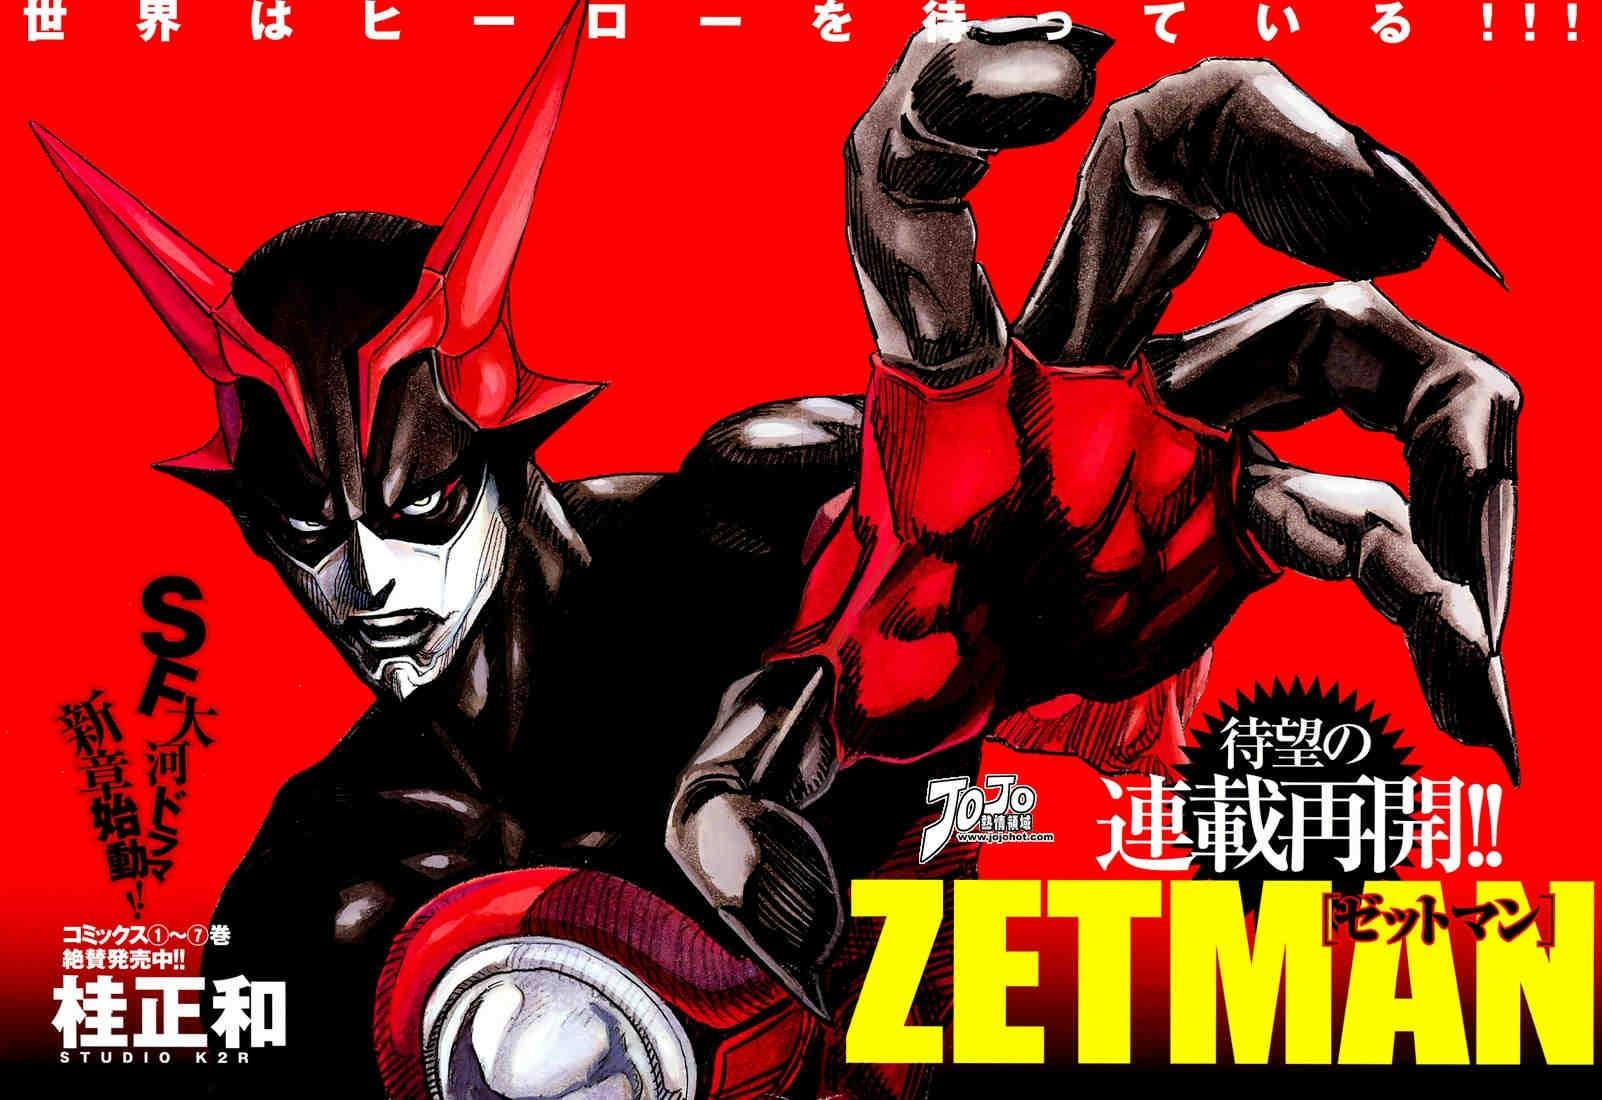 kindle漫画:《ZETMAN超魔人》1-20卷(完结)